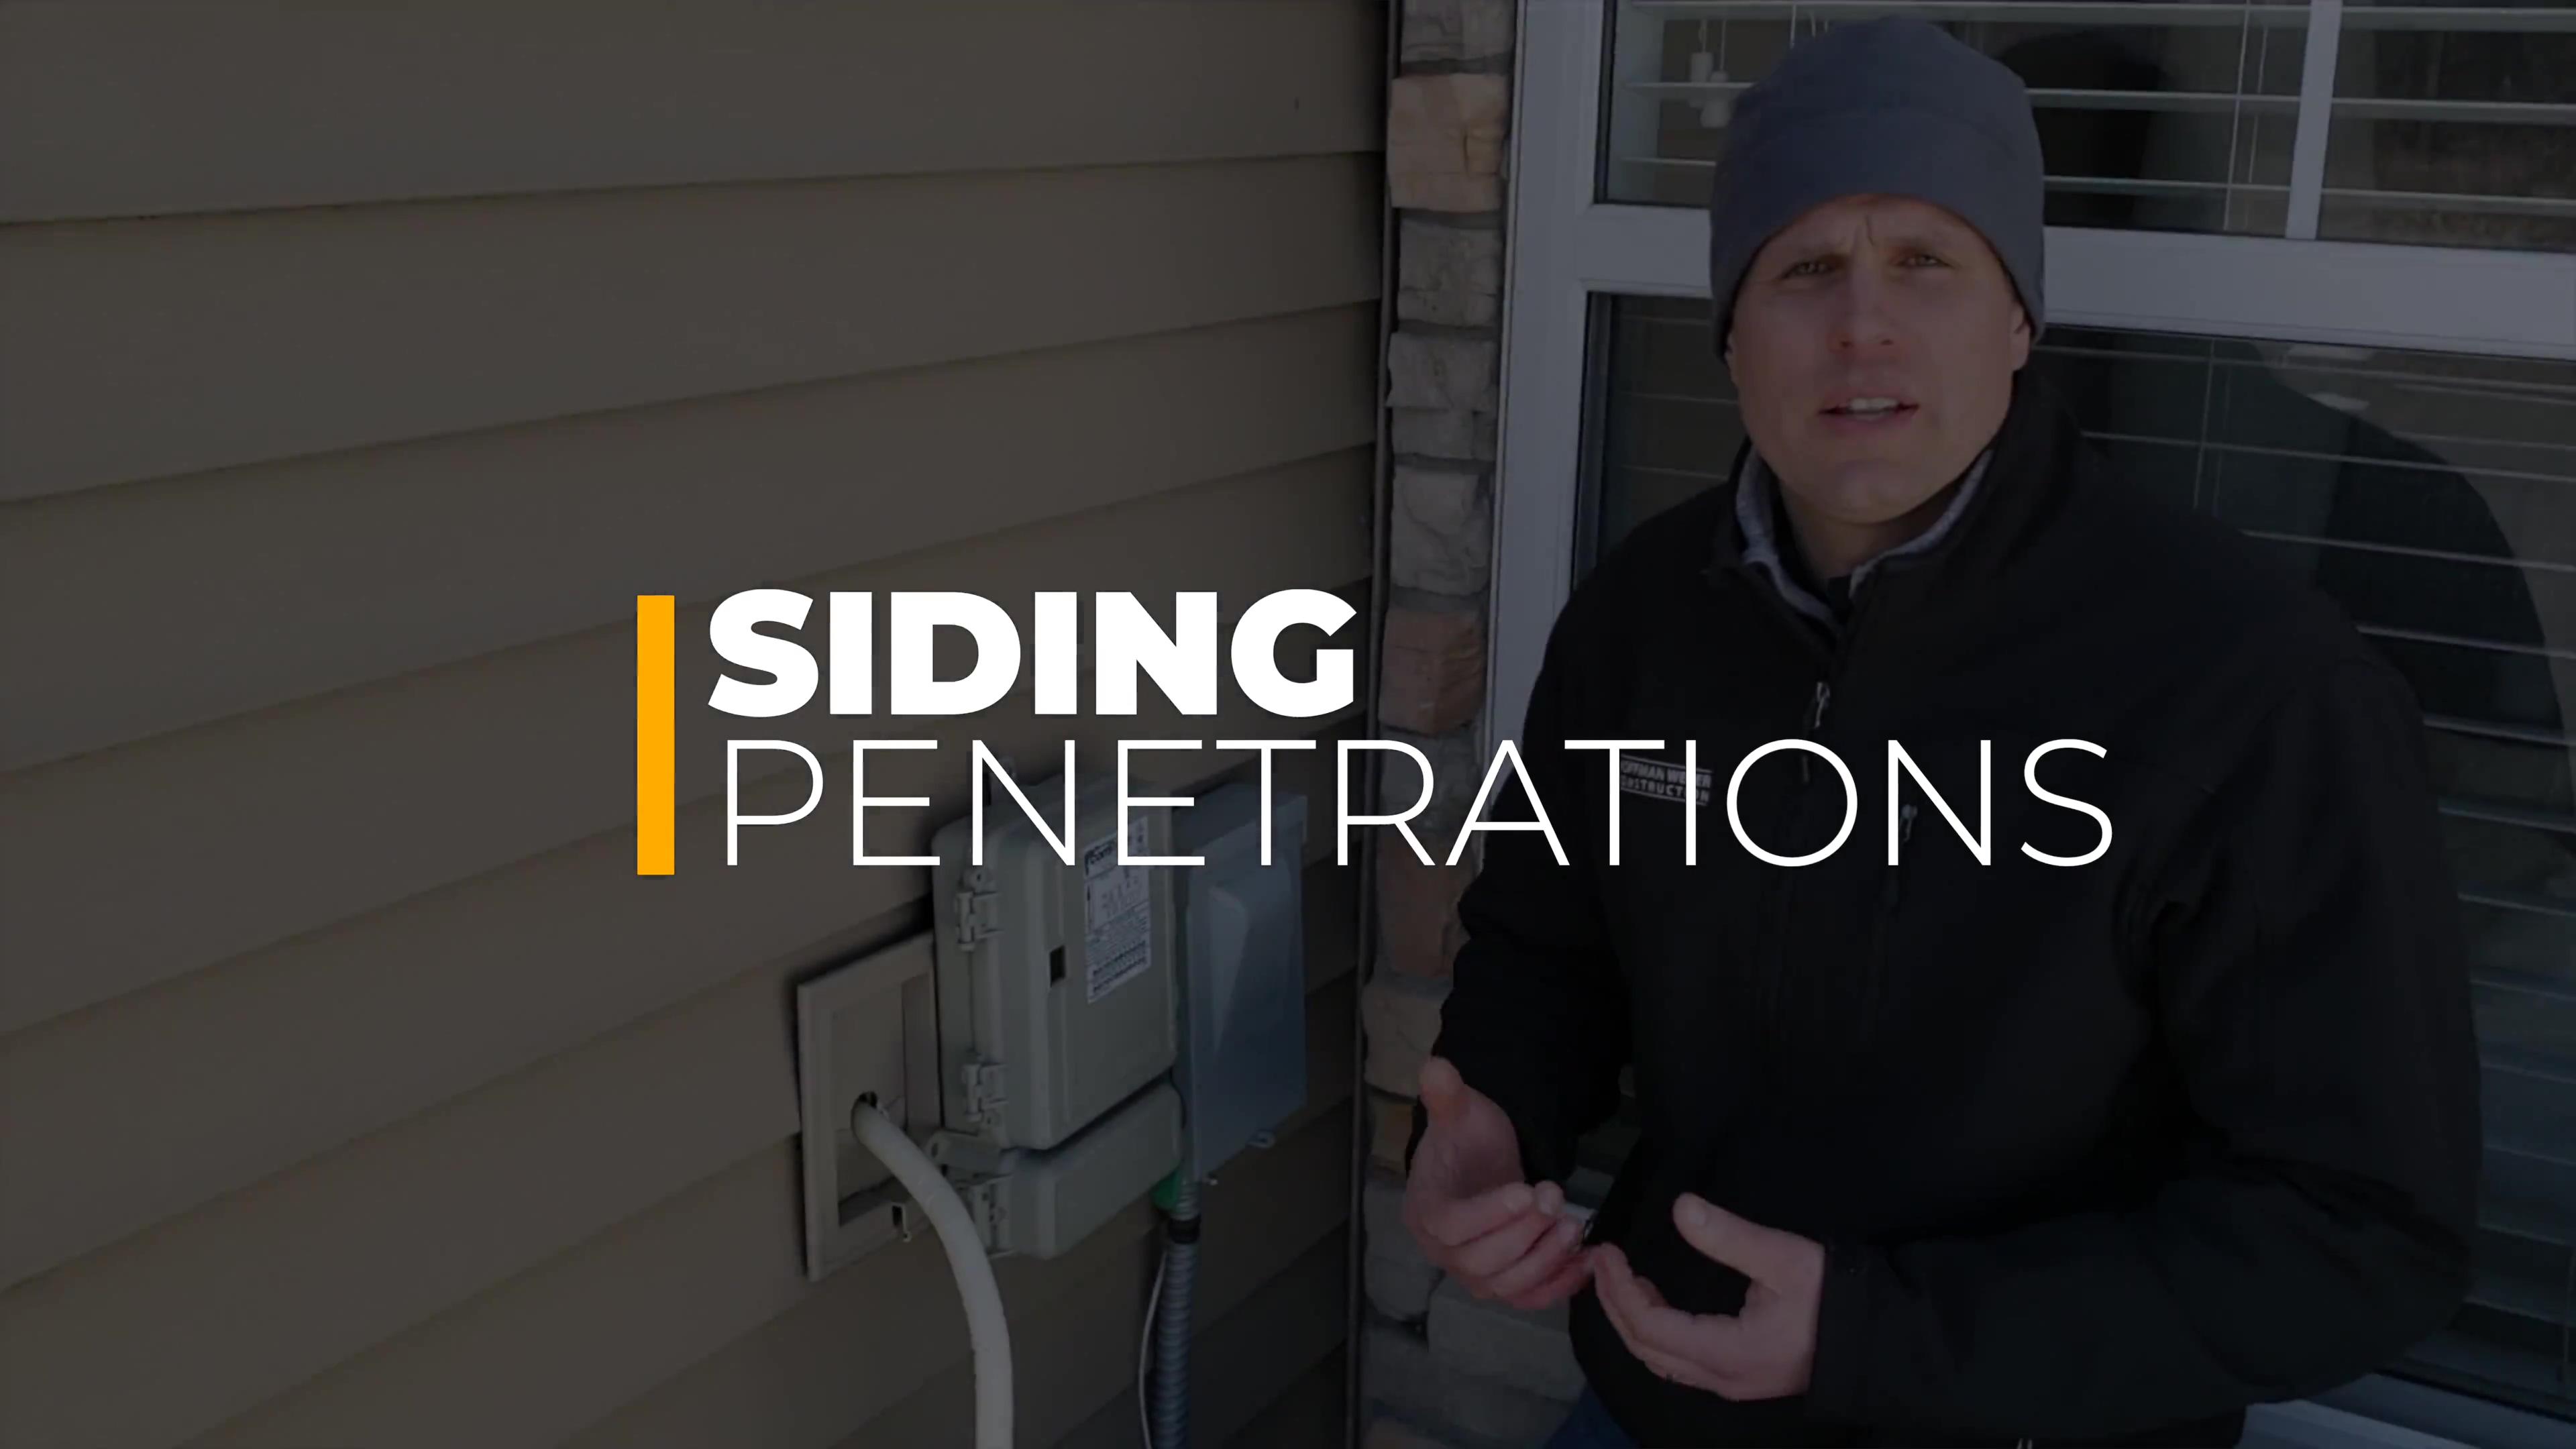 Siding Penetrations-4K